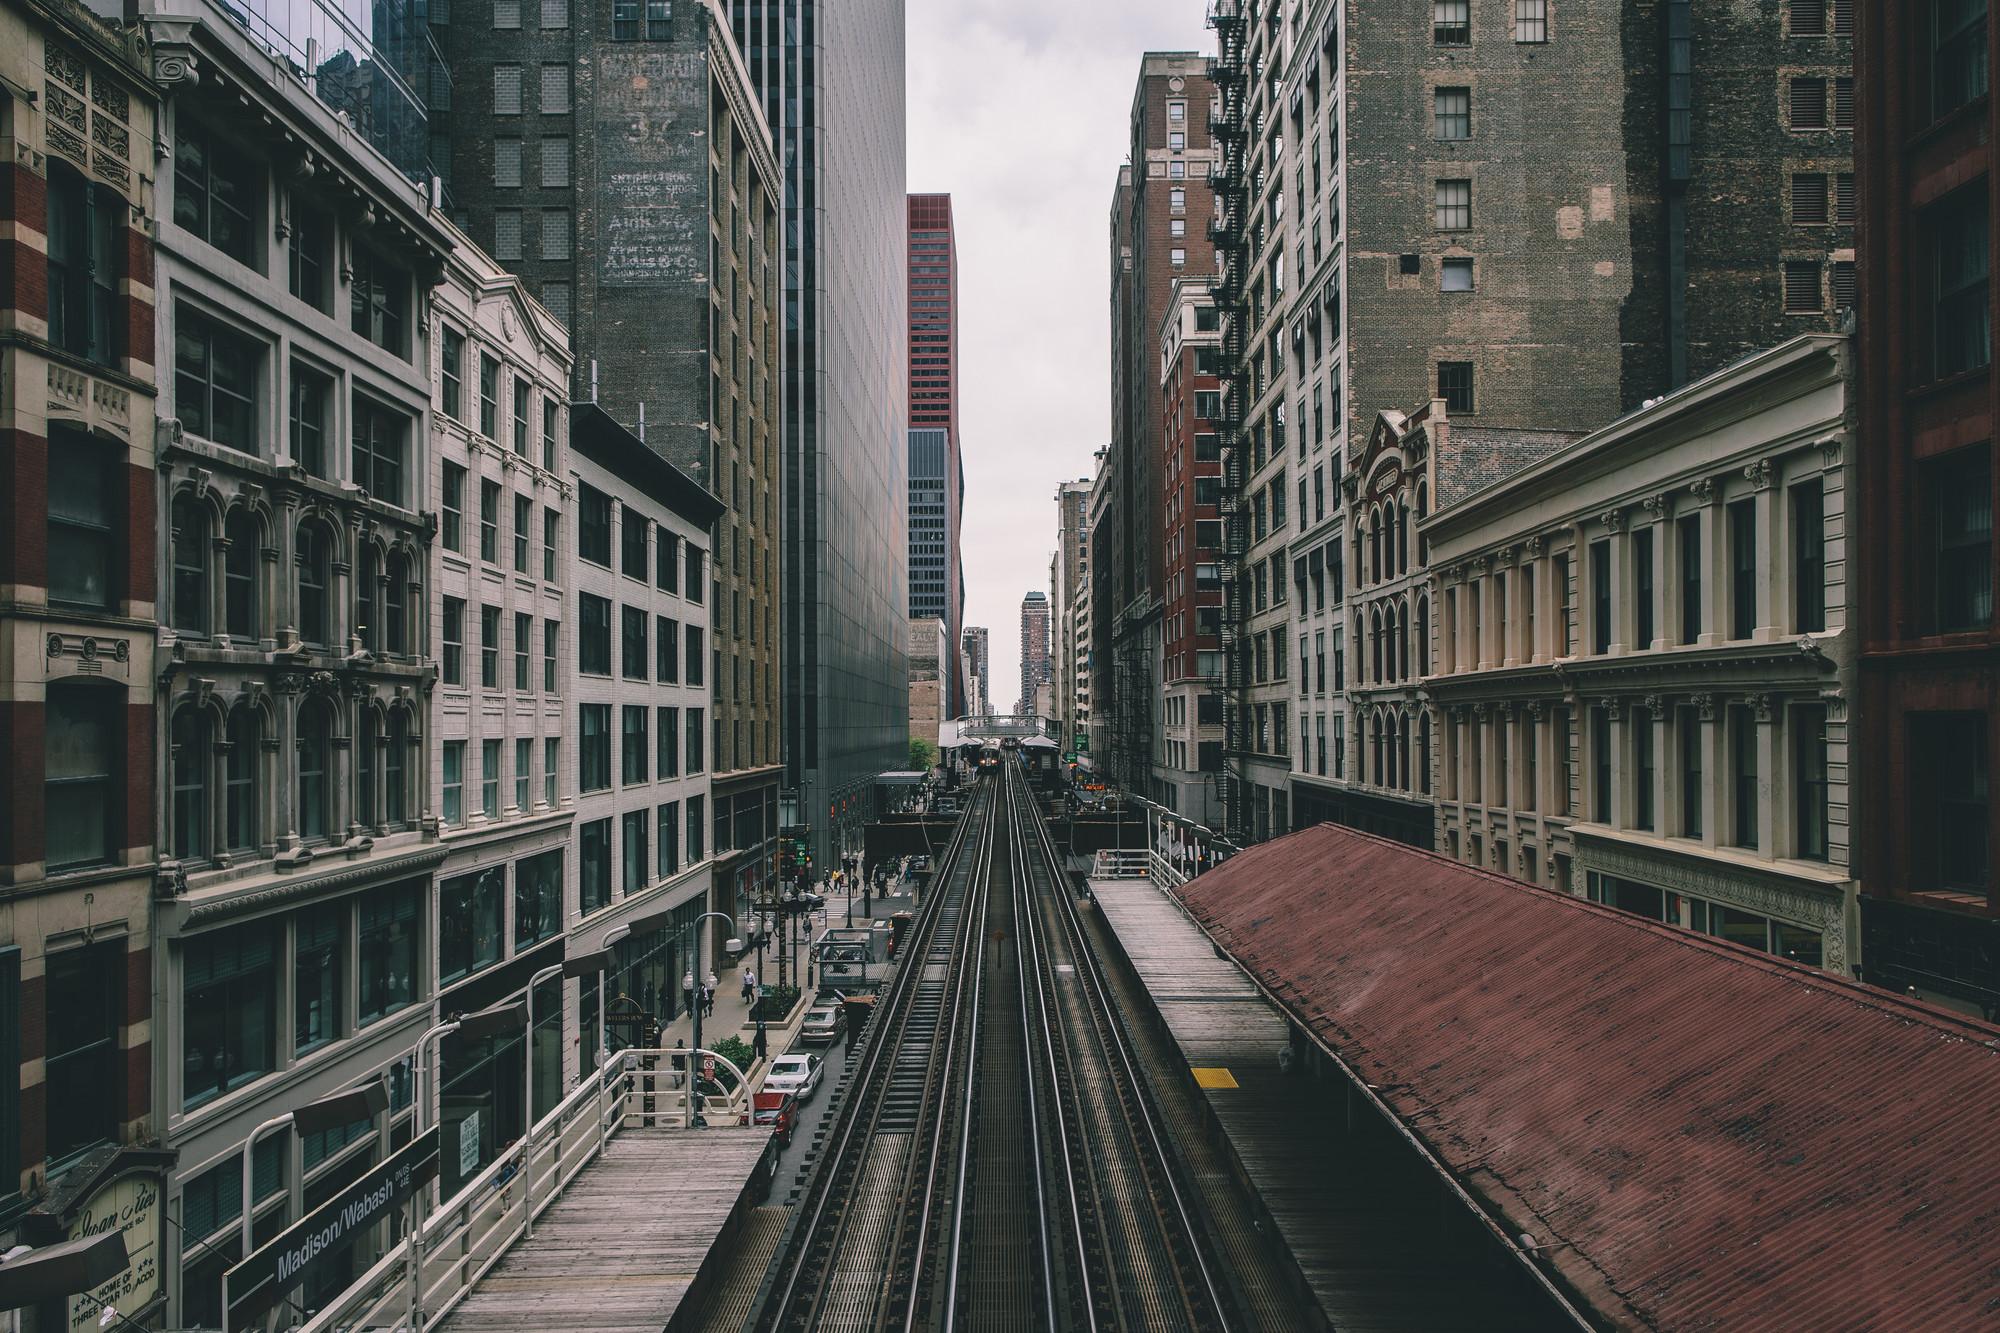 Online Class / Cityscape Photography: Capture Your City's Story, http://instagram.com/trashhand